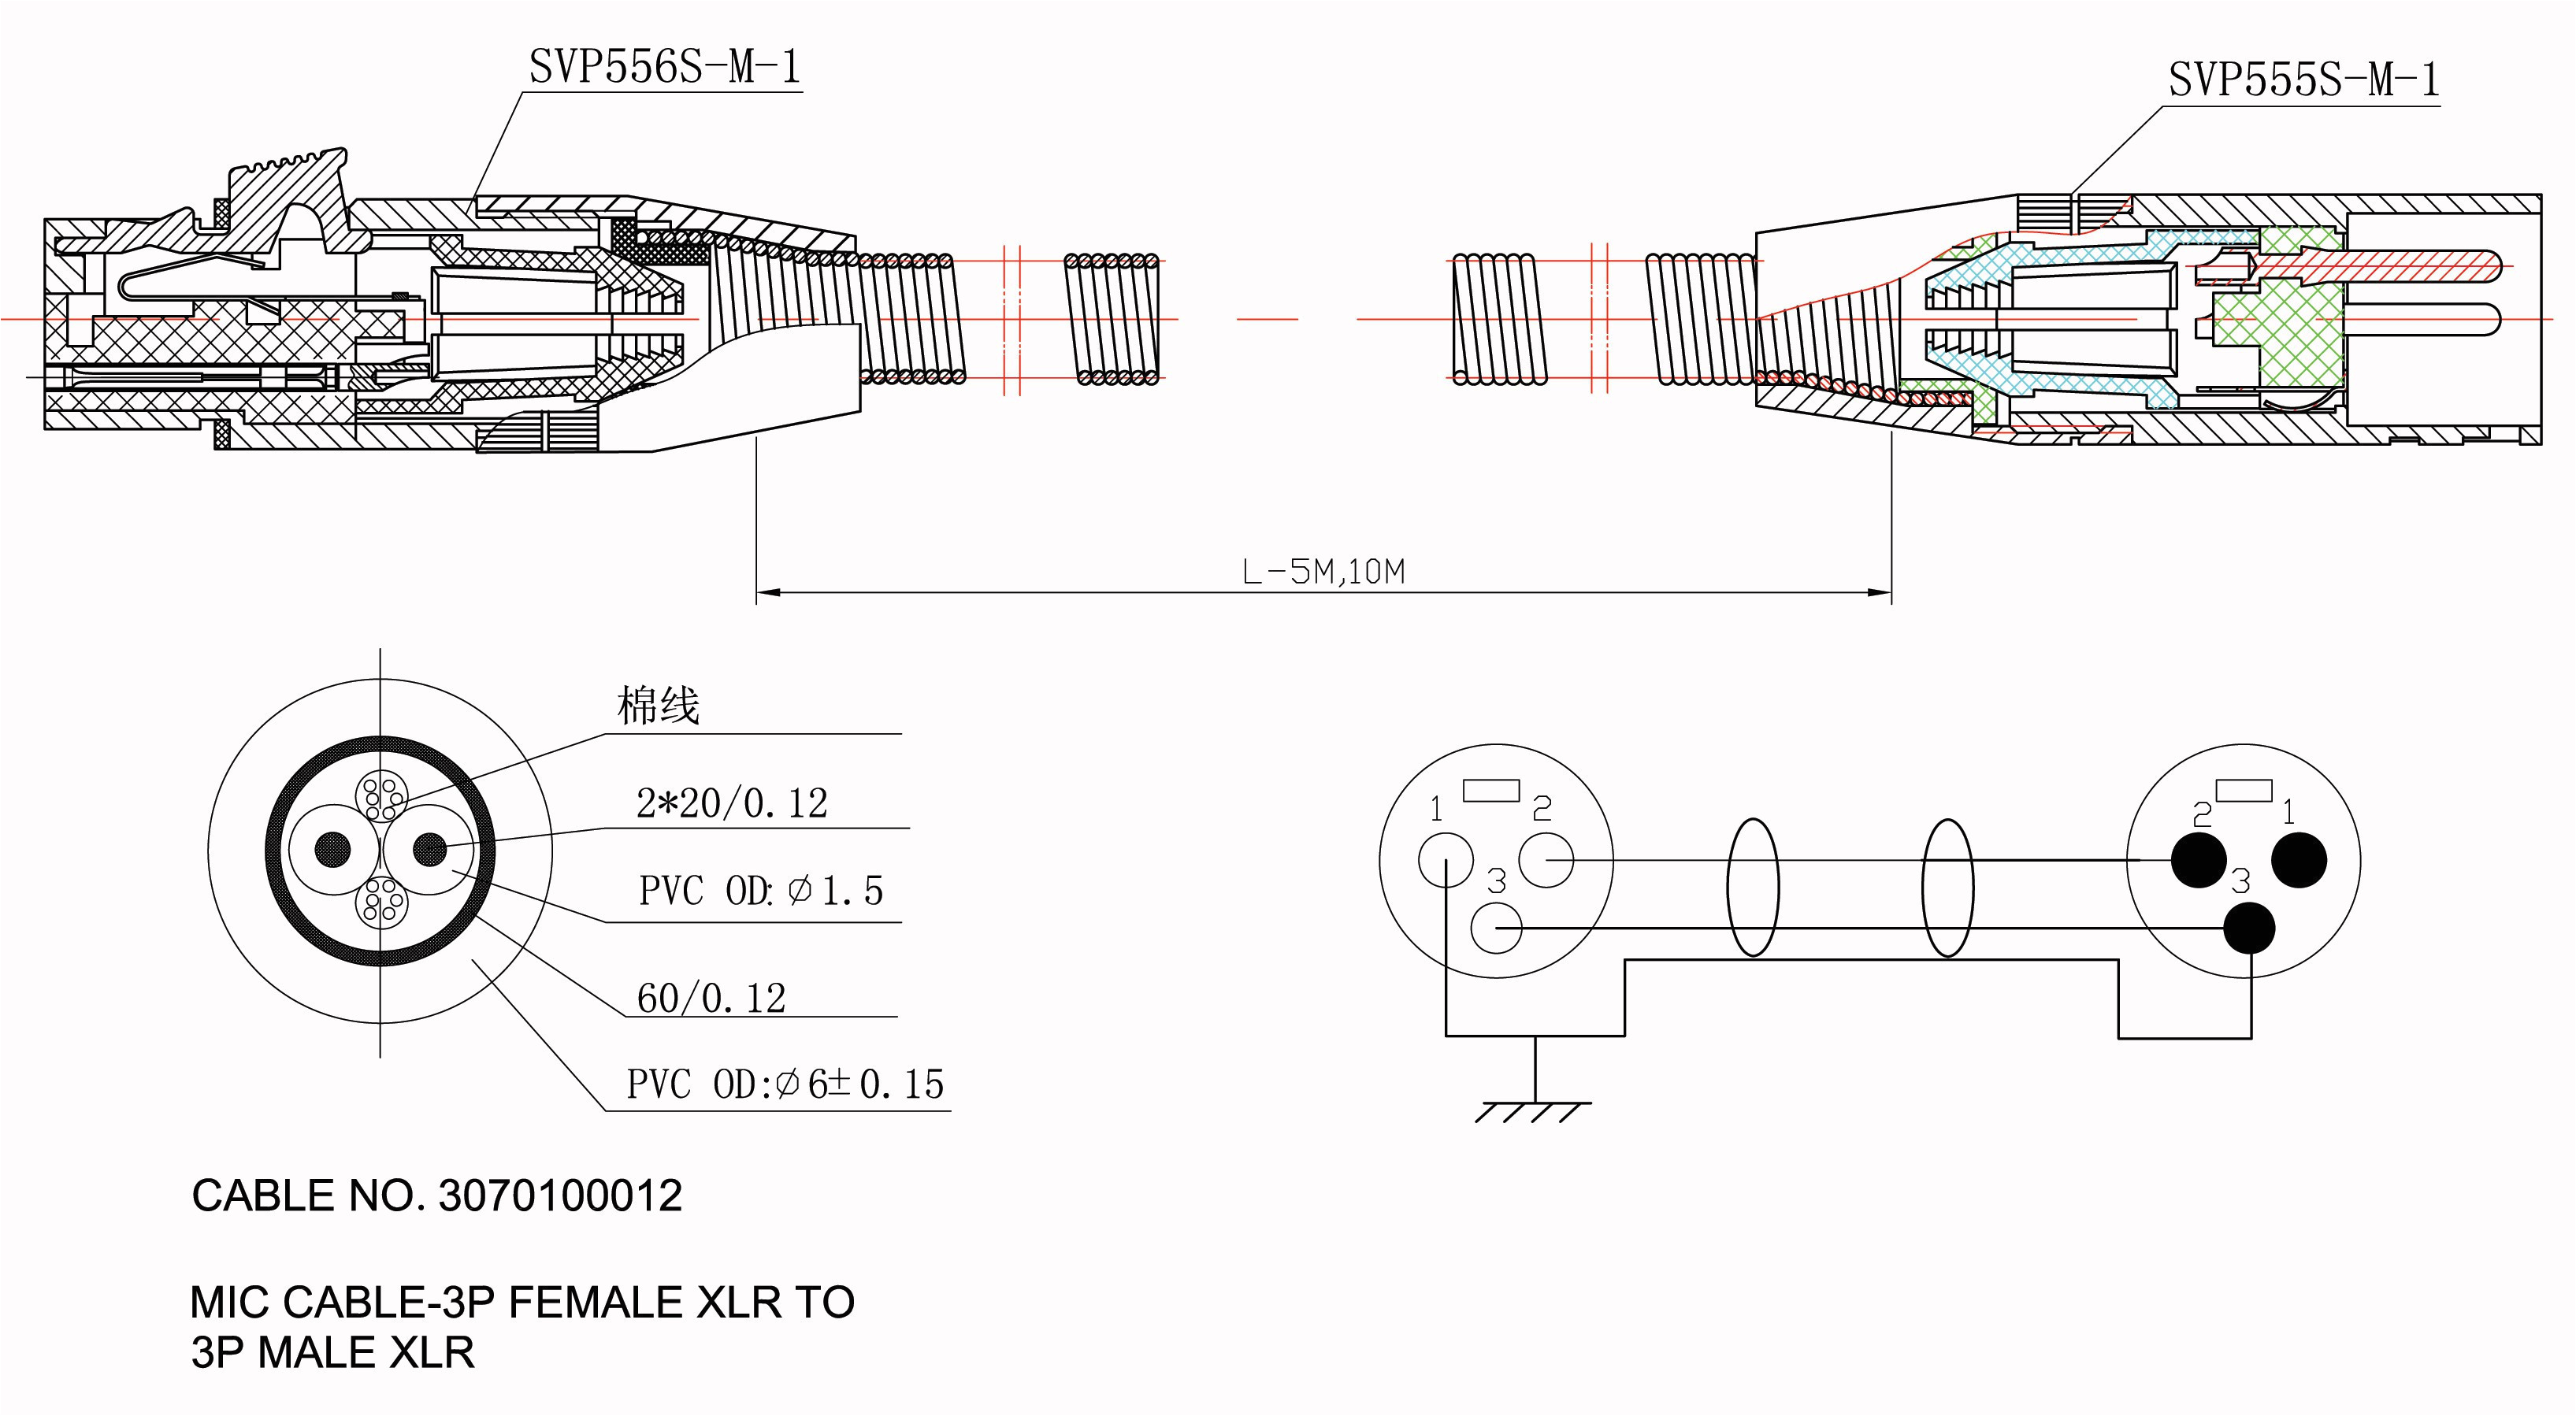 Master Control House Wiring Diagram Master Control House Wiring Diagram New Master Control House Wiring